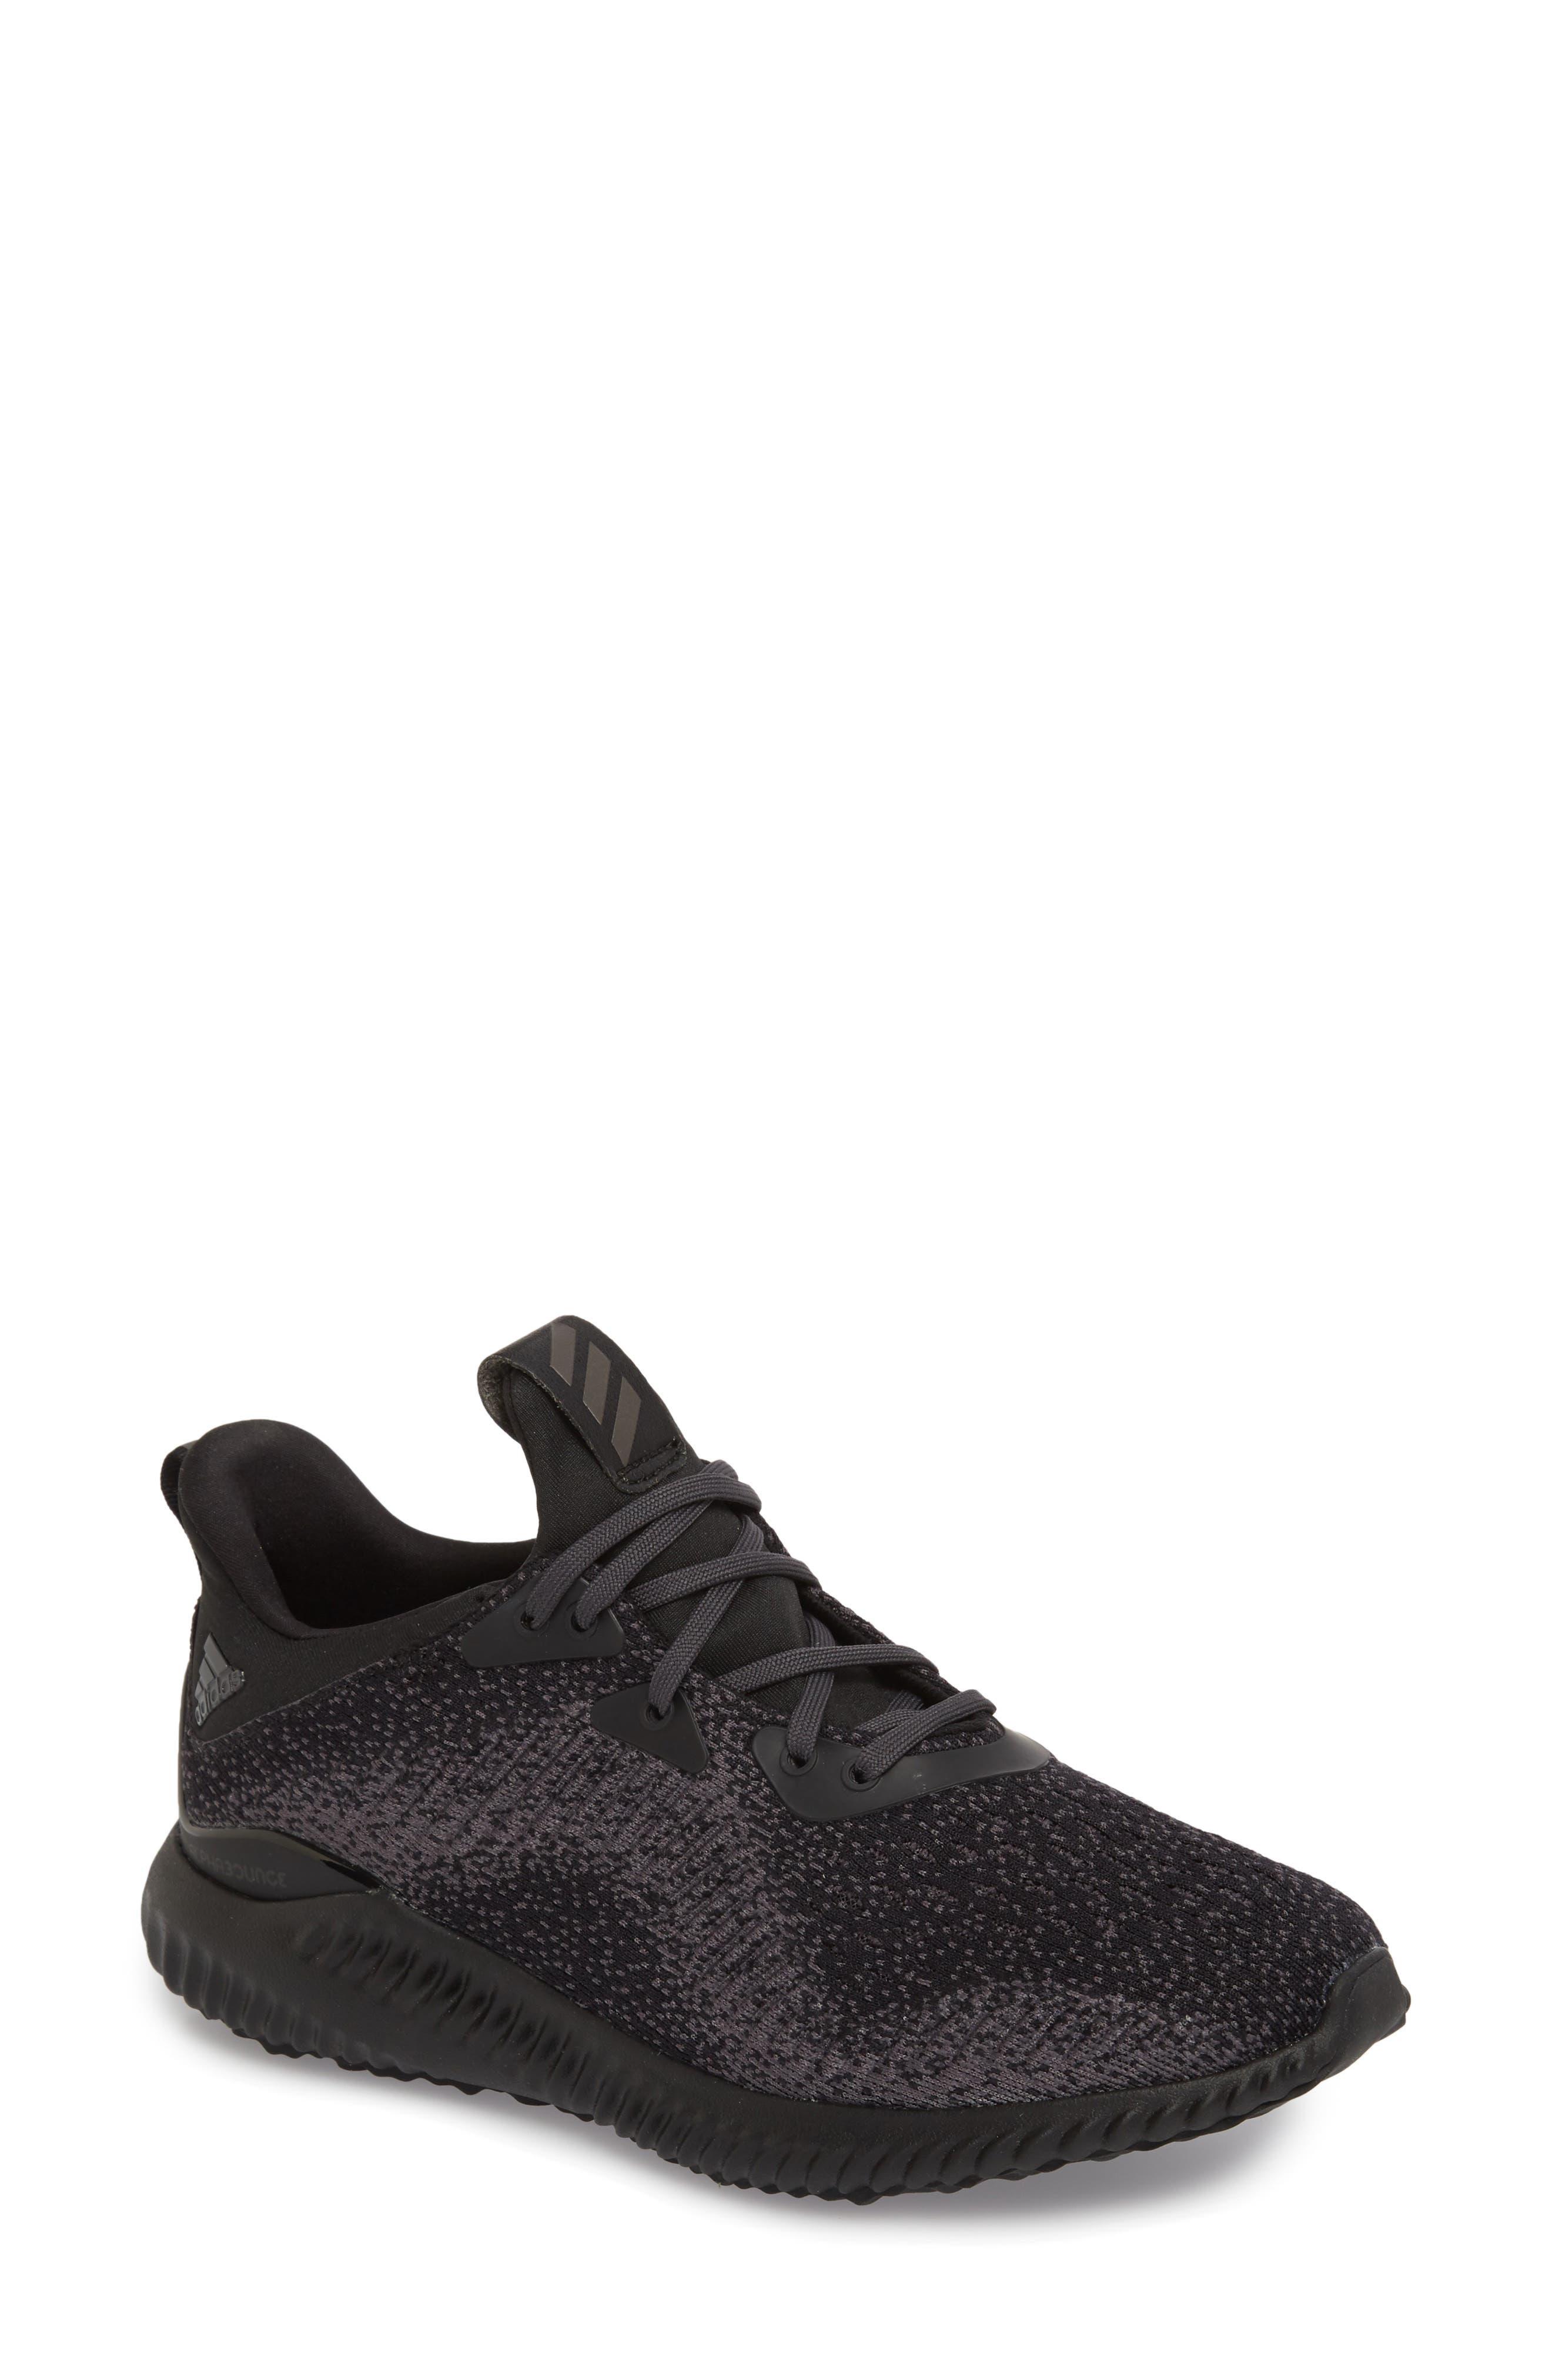 AlphaBounce EM Running Shoe,                         Main,                         color, Core Black/ Trace Grey/ Carbon